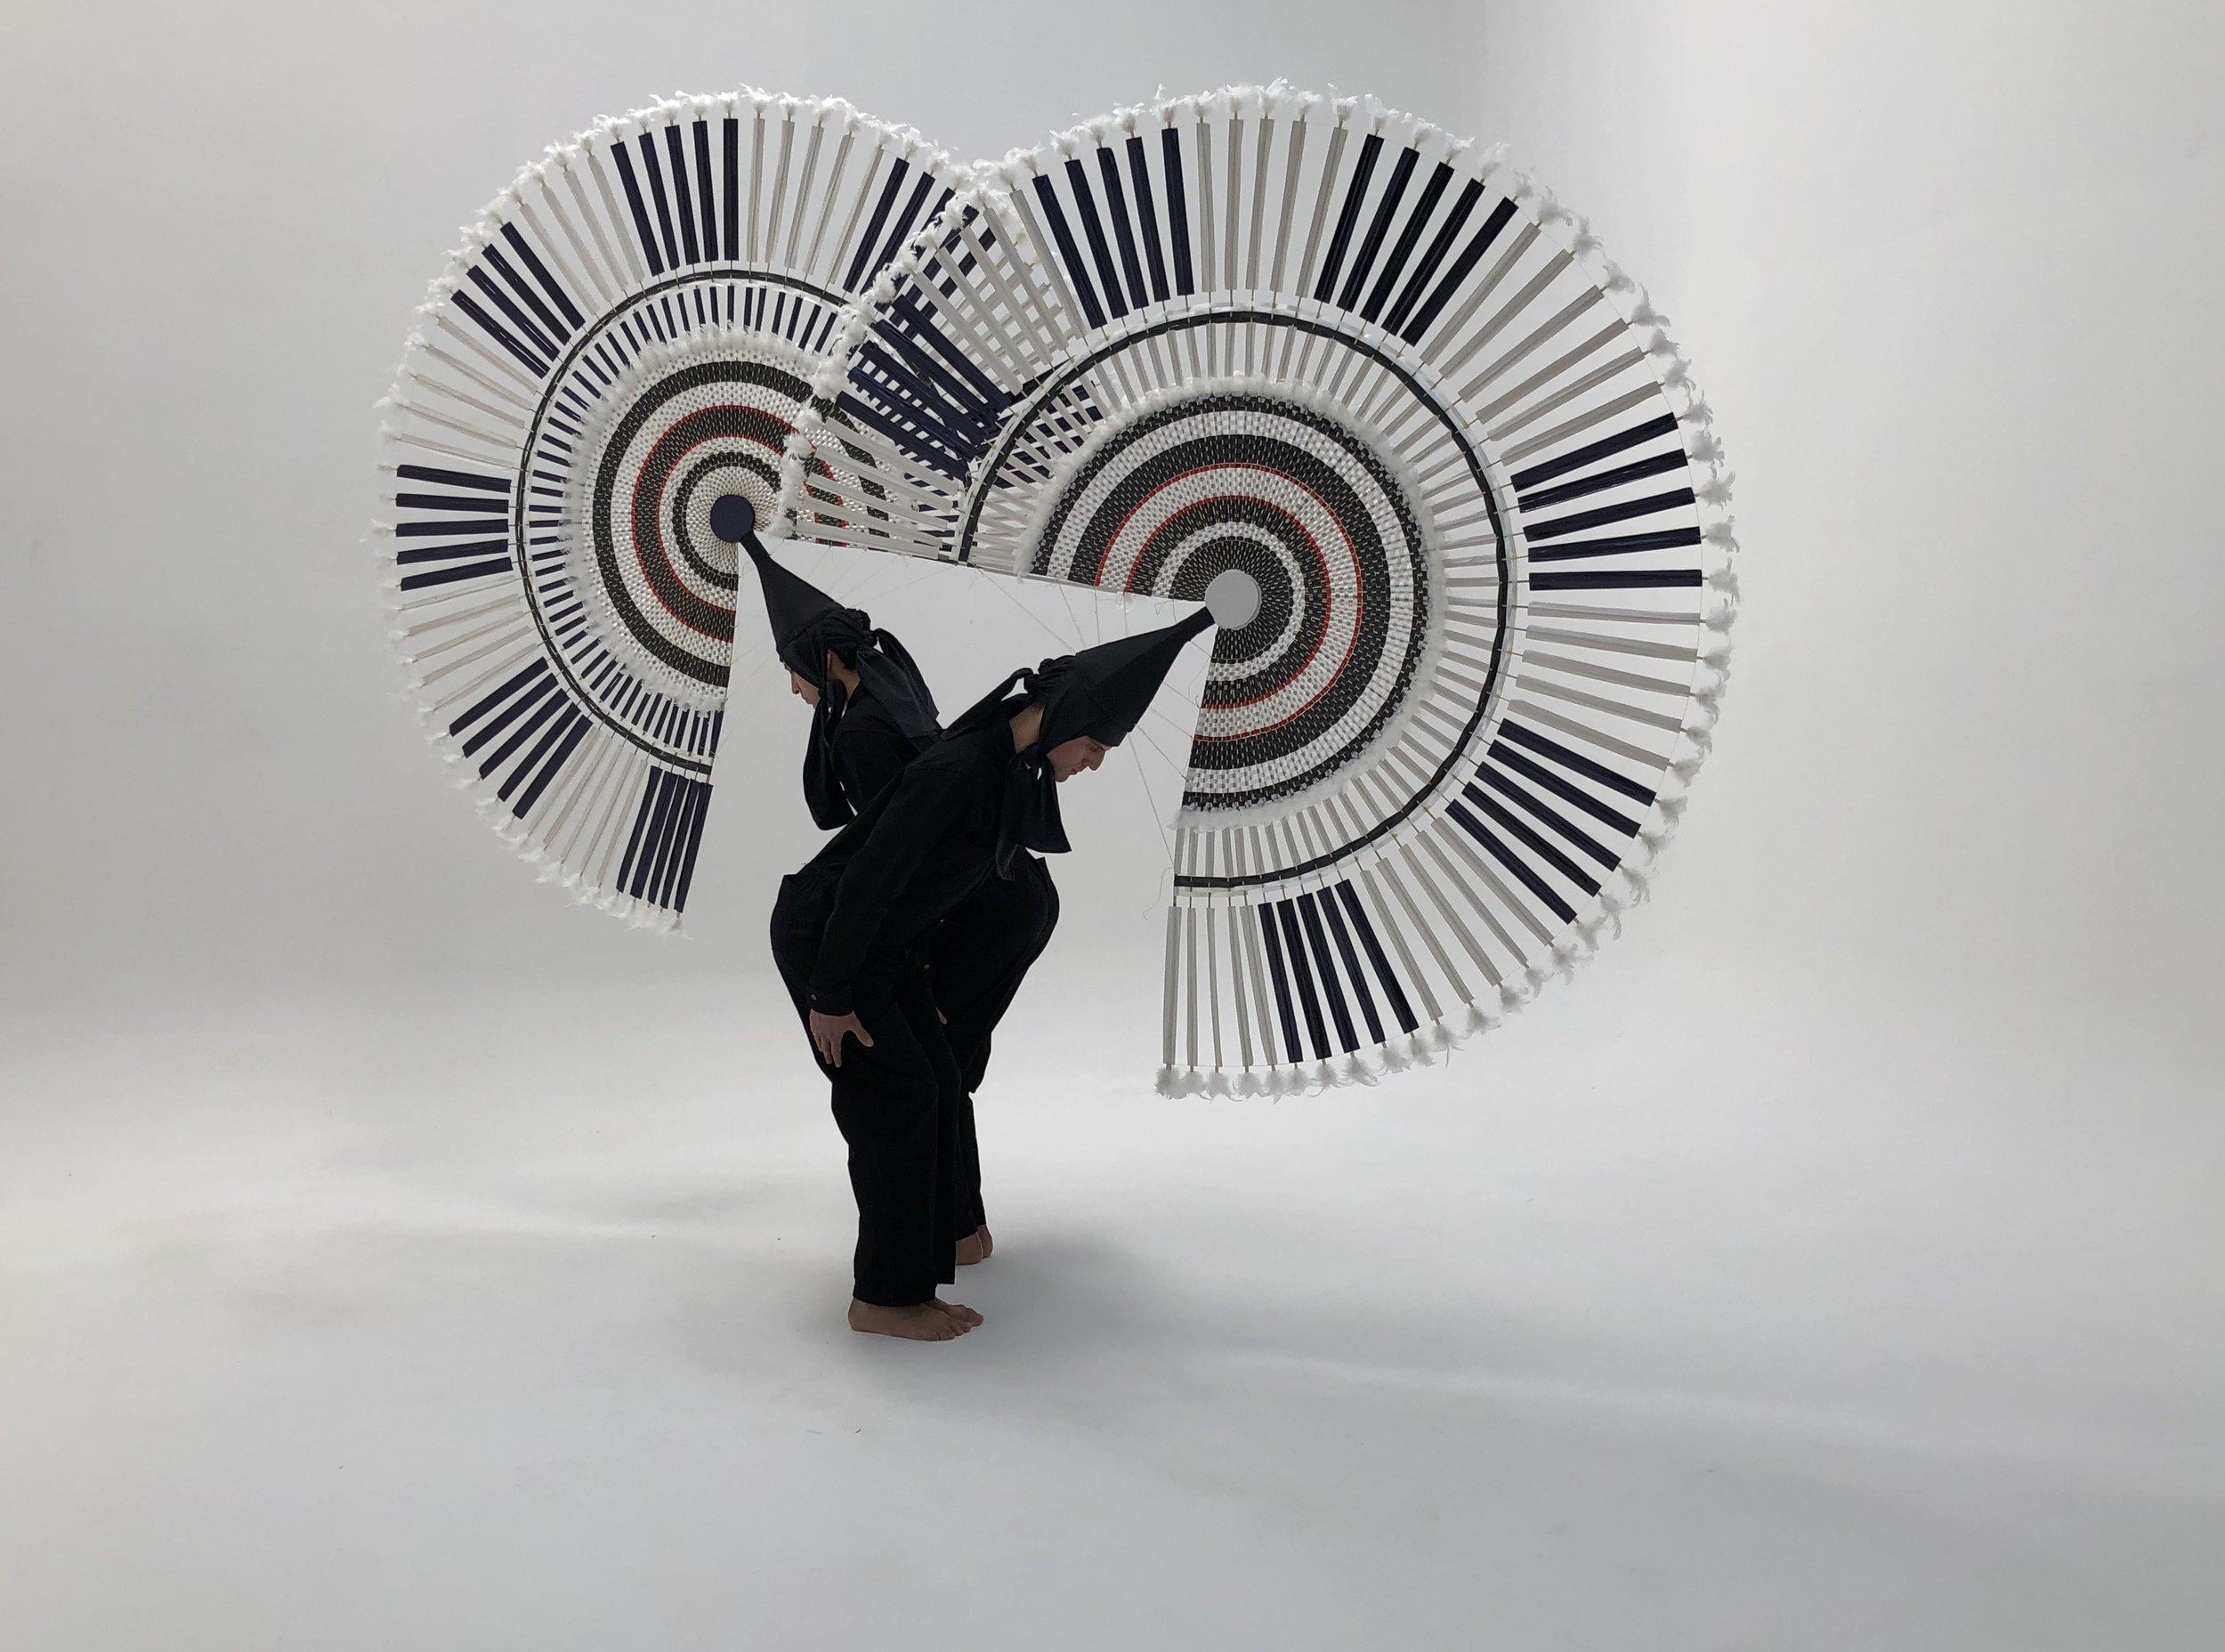 Image Credit: Tania Candiani, Reverencia , 2019, Choreographic Action Penachos: Maestro Marcos Anderete Dancers,Francisco Rojas and Carlos Coronel. Courtesy of the artist and Galeria Vermelho.